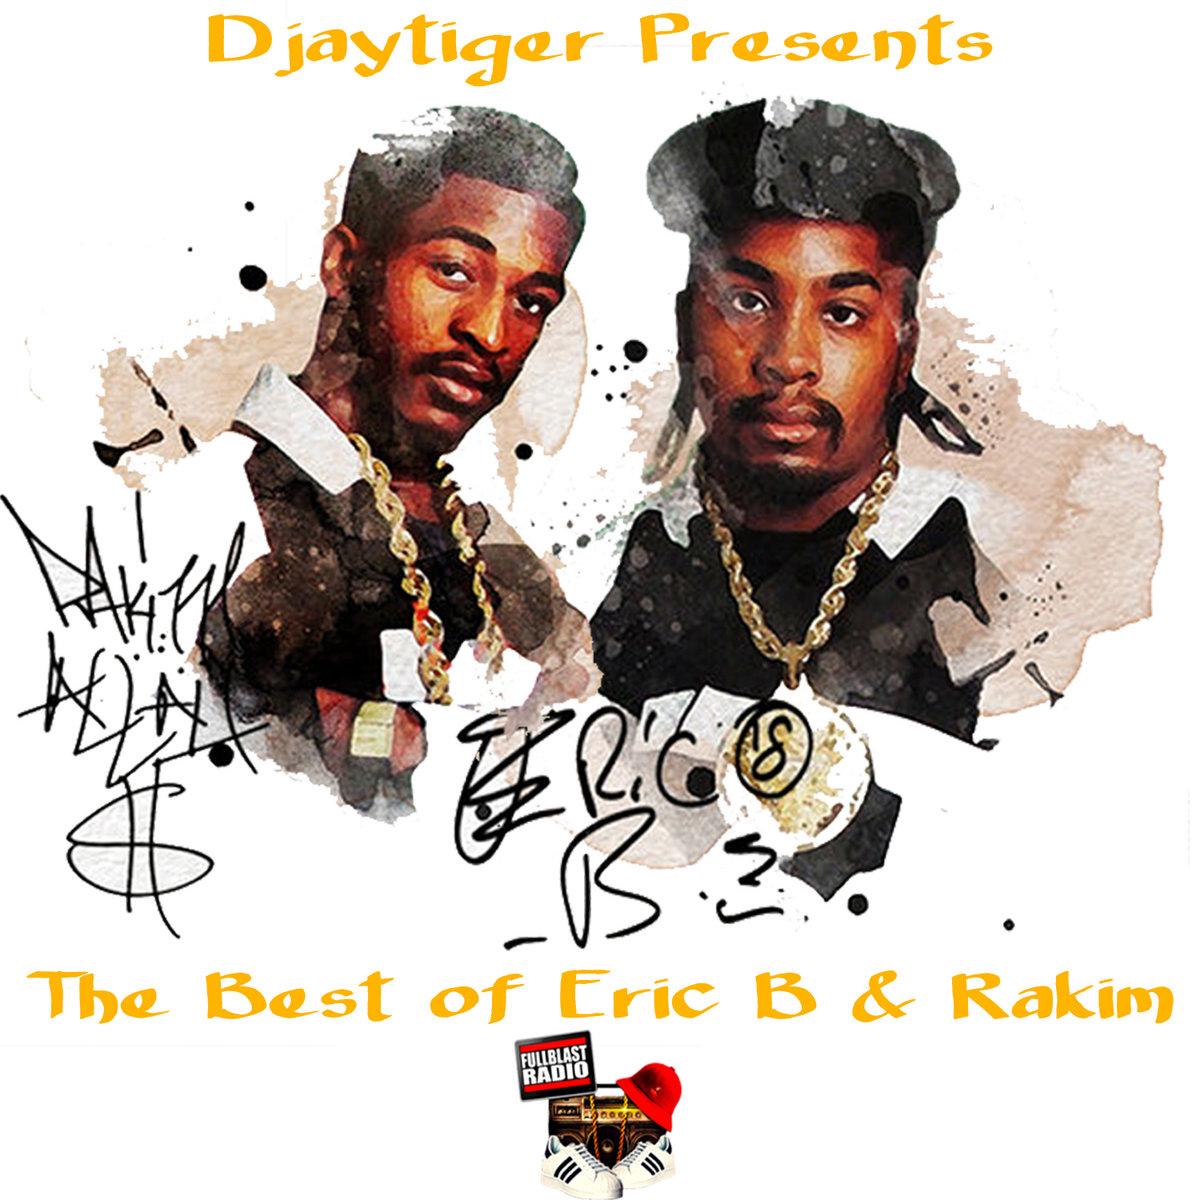 Djaytiger Presents The Best of Eric B and Rakim | Fullblast Radio